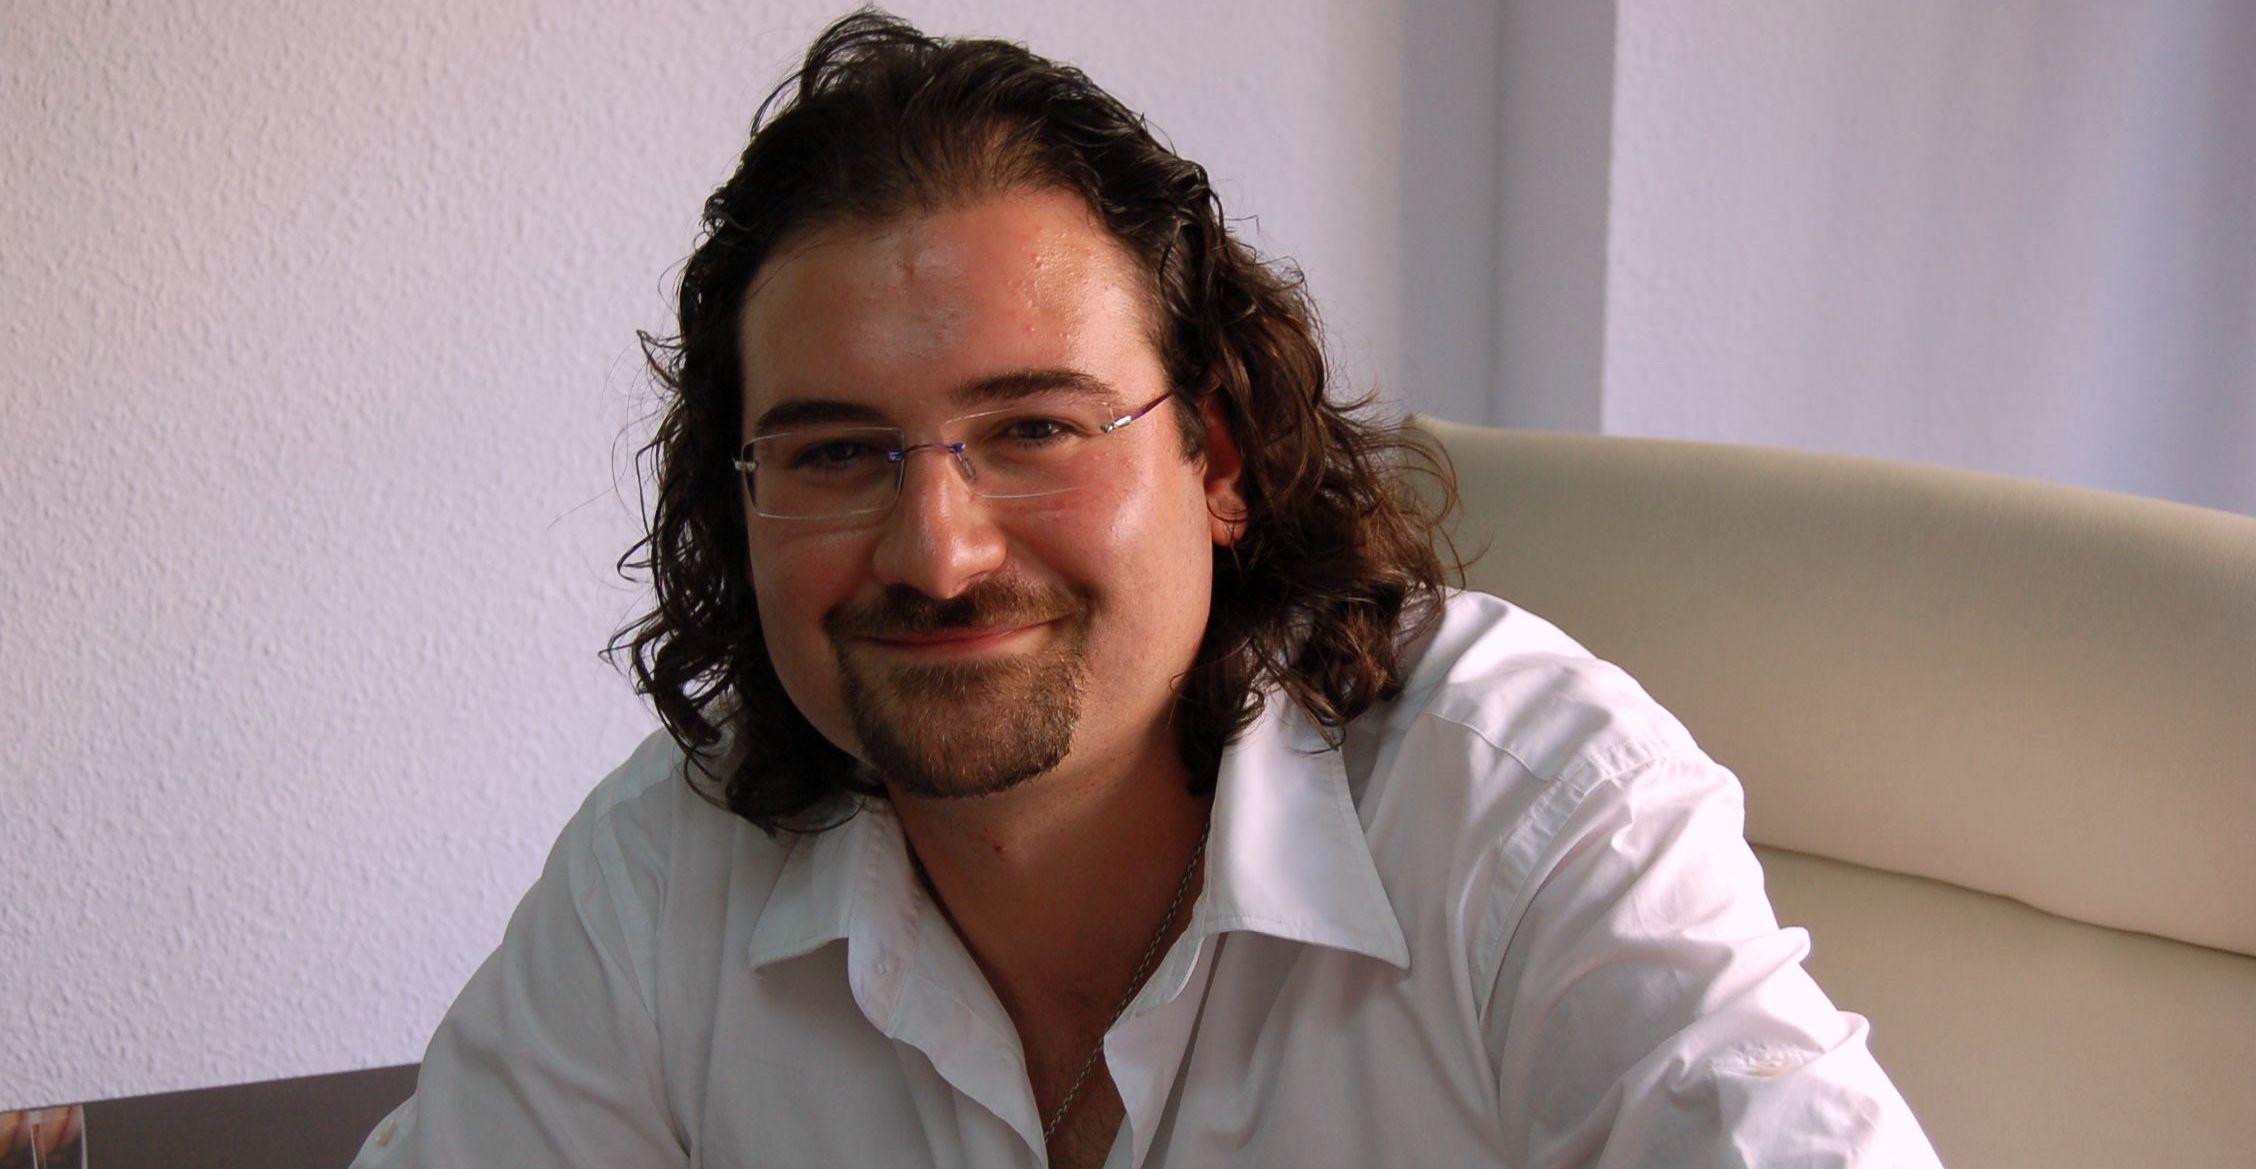 C.J. Navas